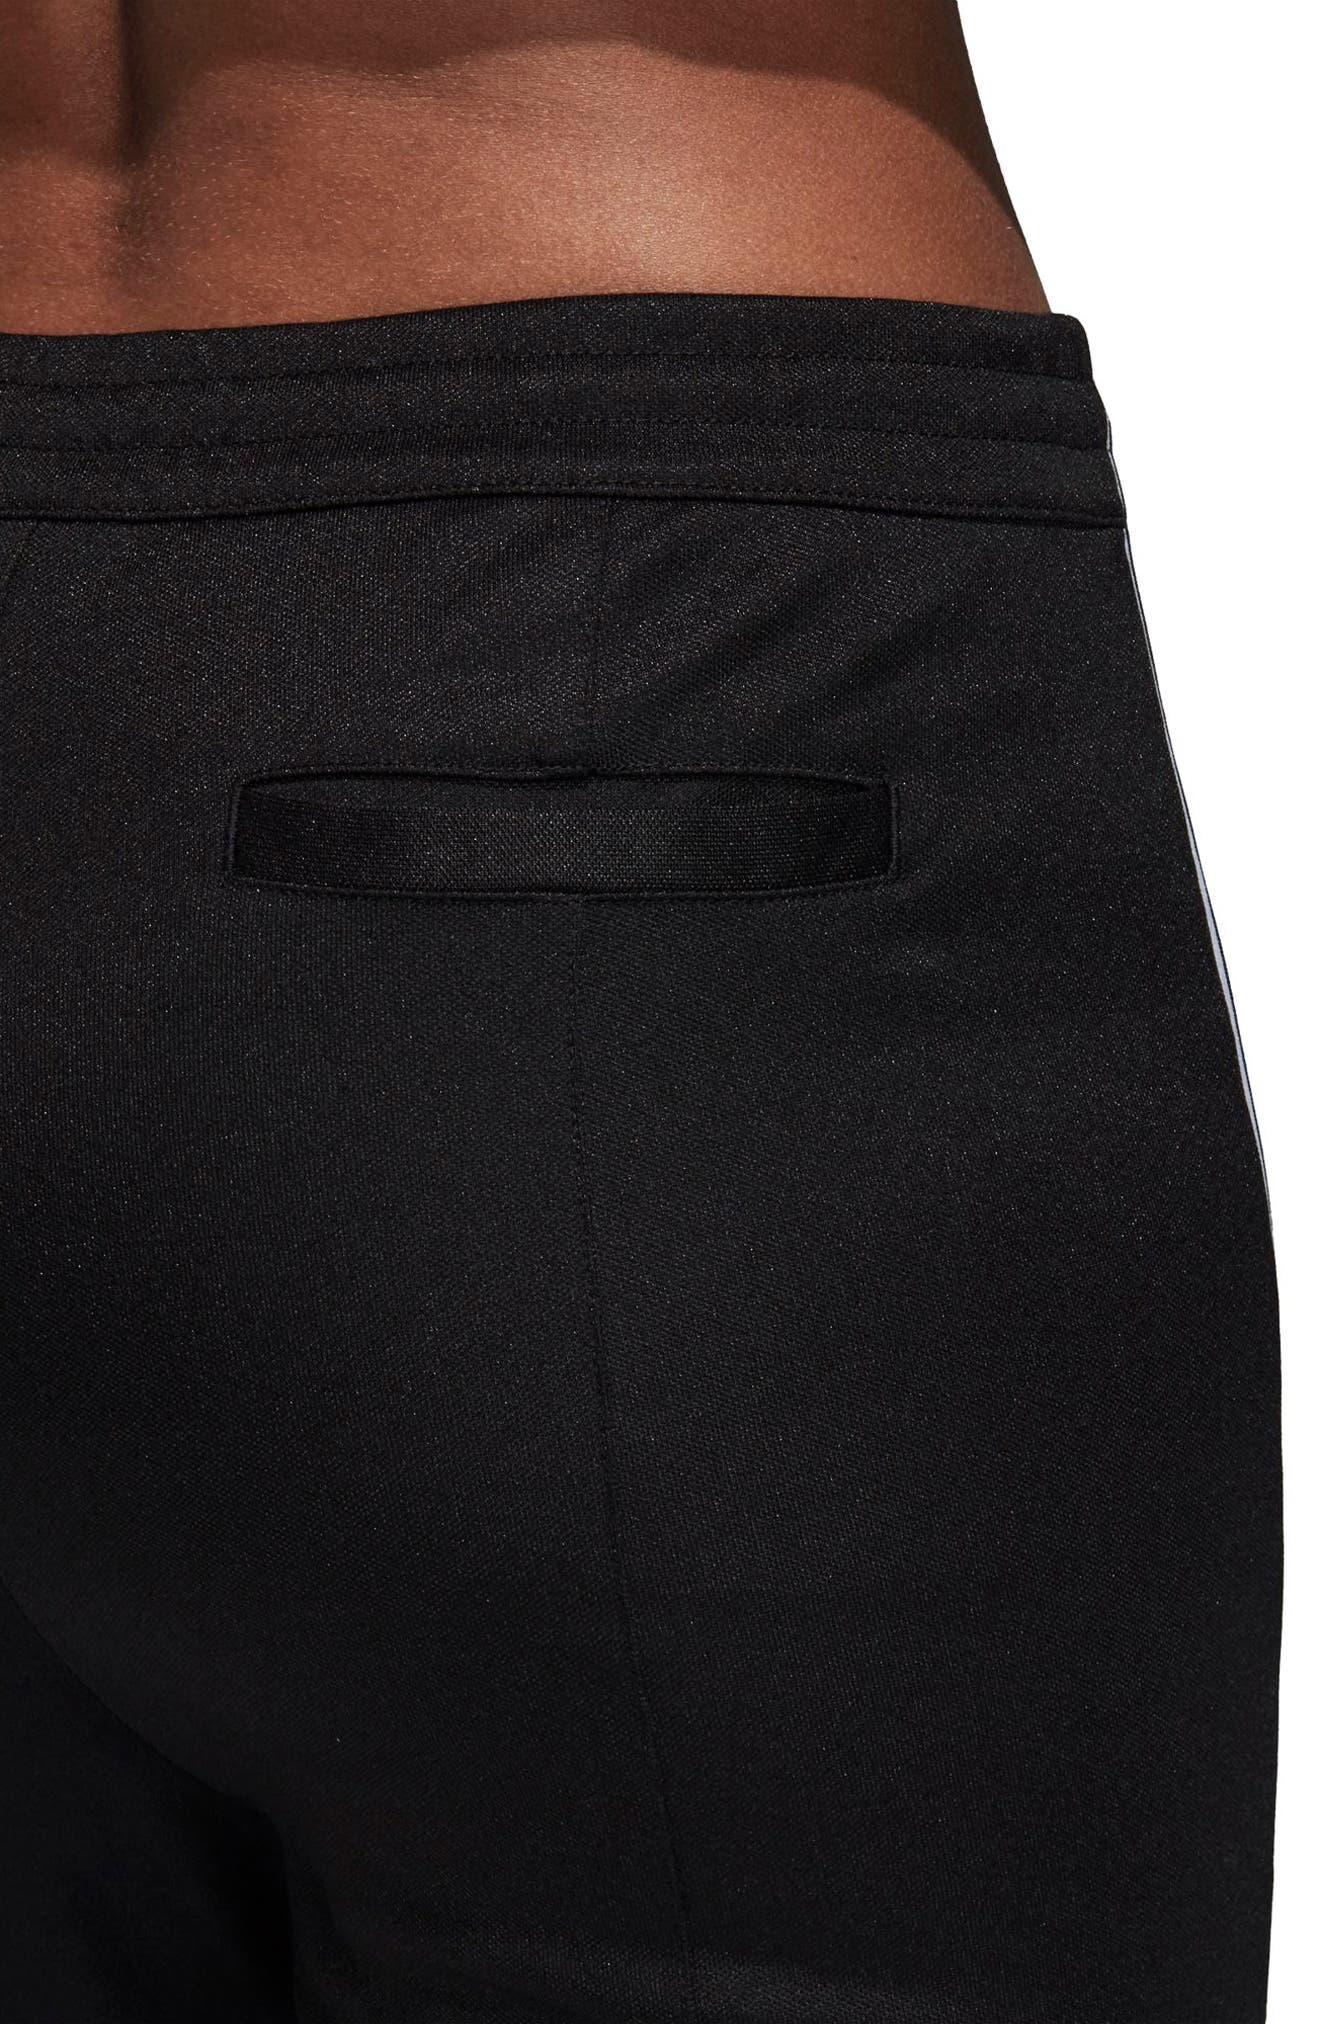 adidas 3 Stripe Track Pants,                             Alternate thumbnail 6, color,                             BLACK